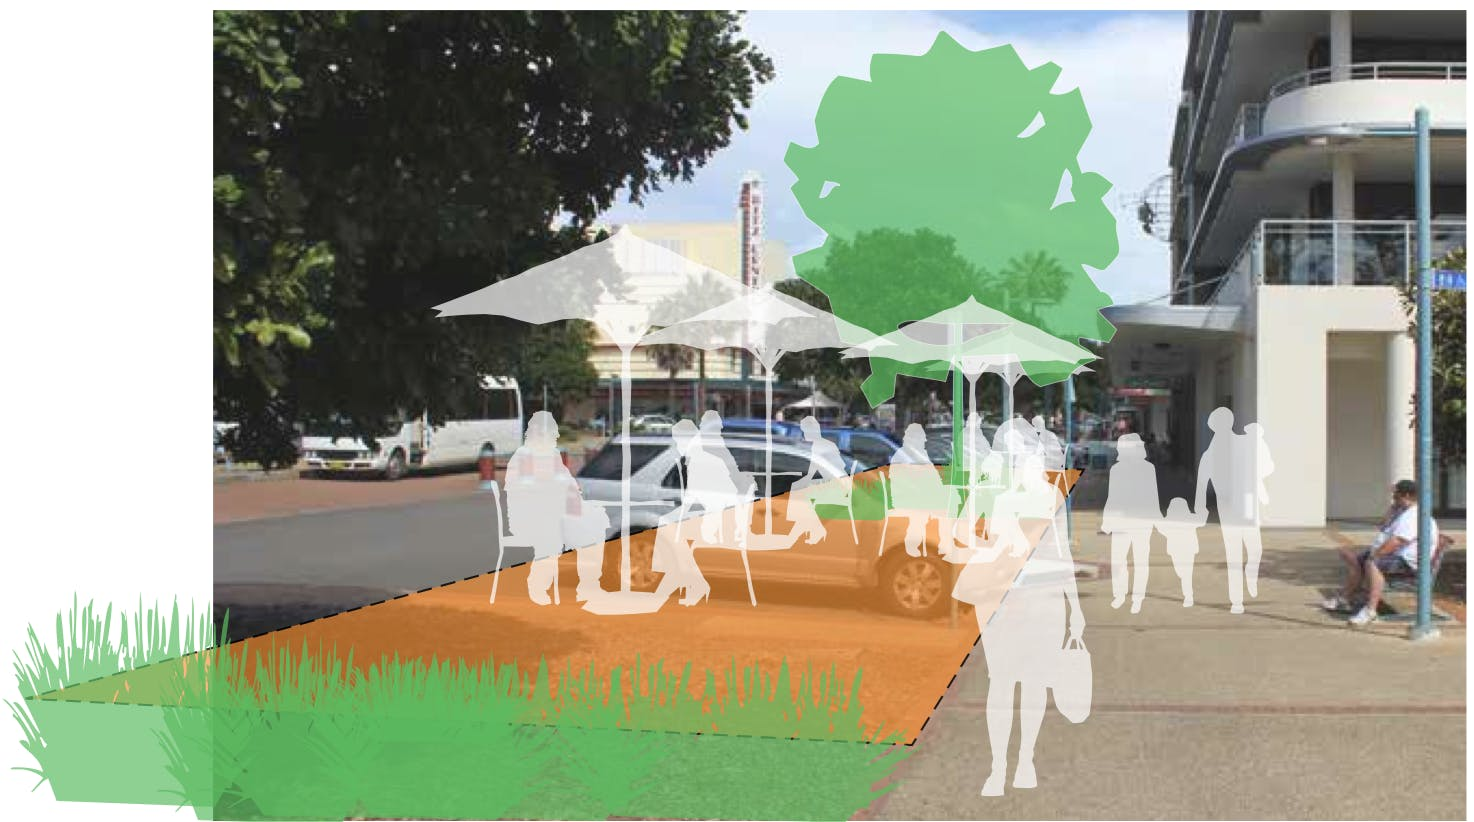 Proposed Horton Street Town Square